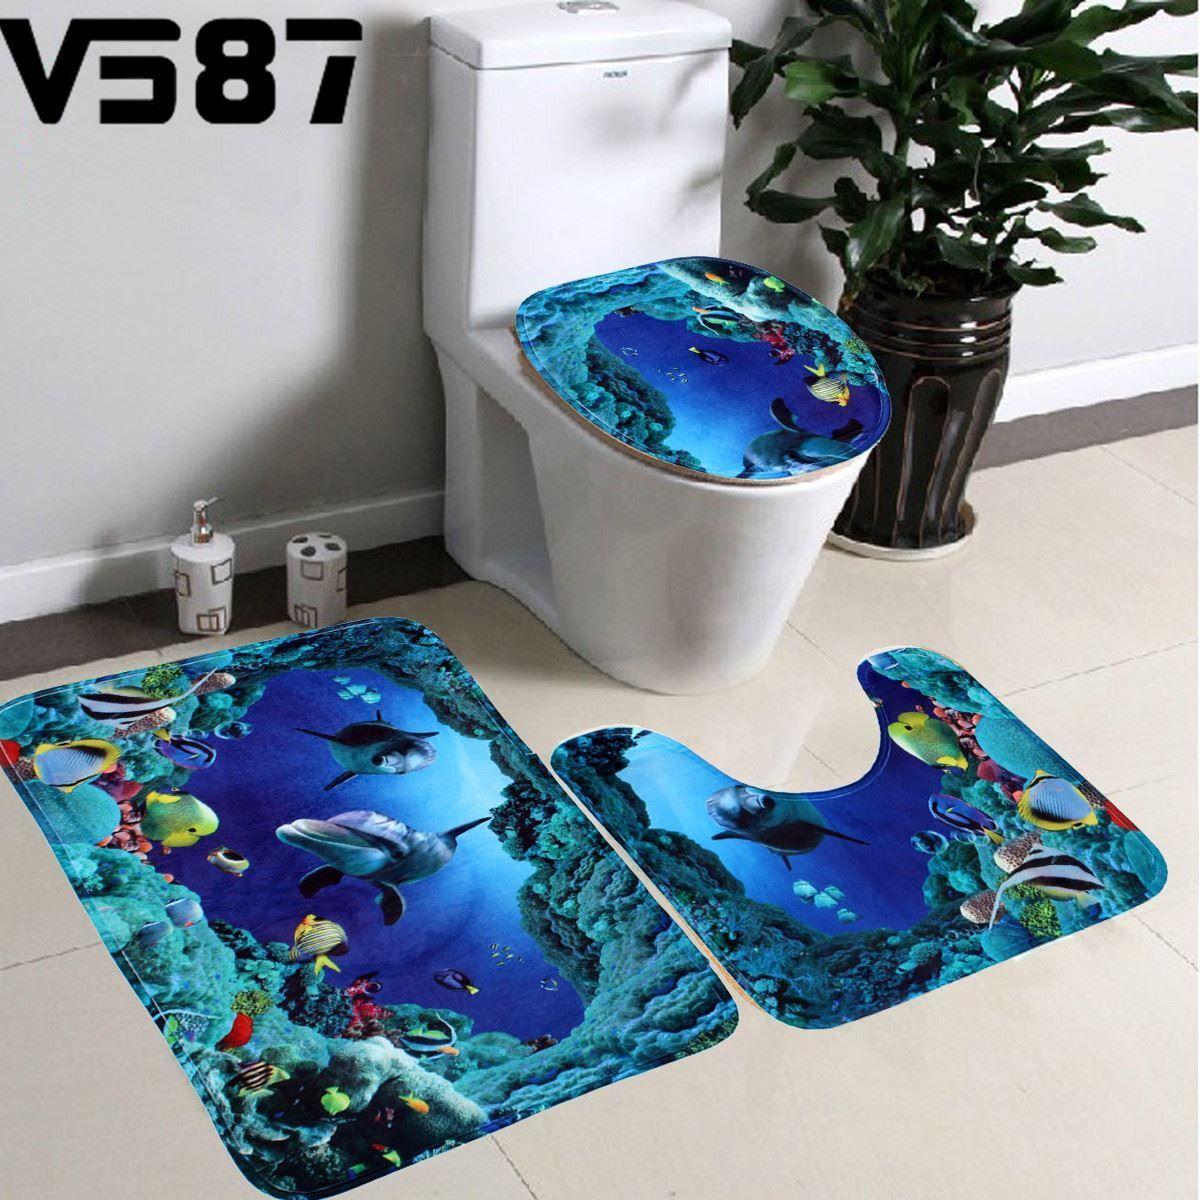 3Pcs/Set Bathroom Slip Resistance Bath Mat Sea World Blue Shark ...